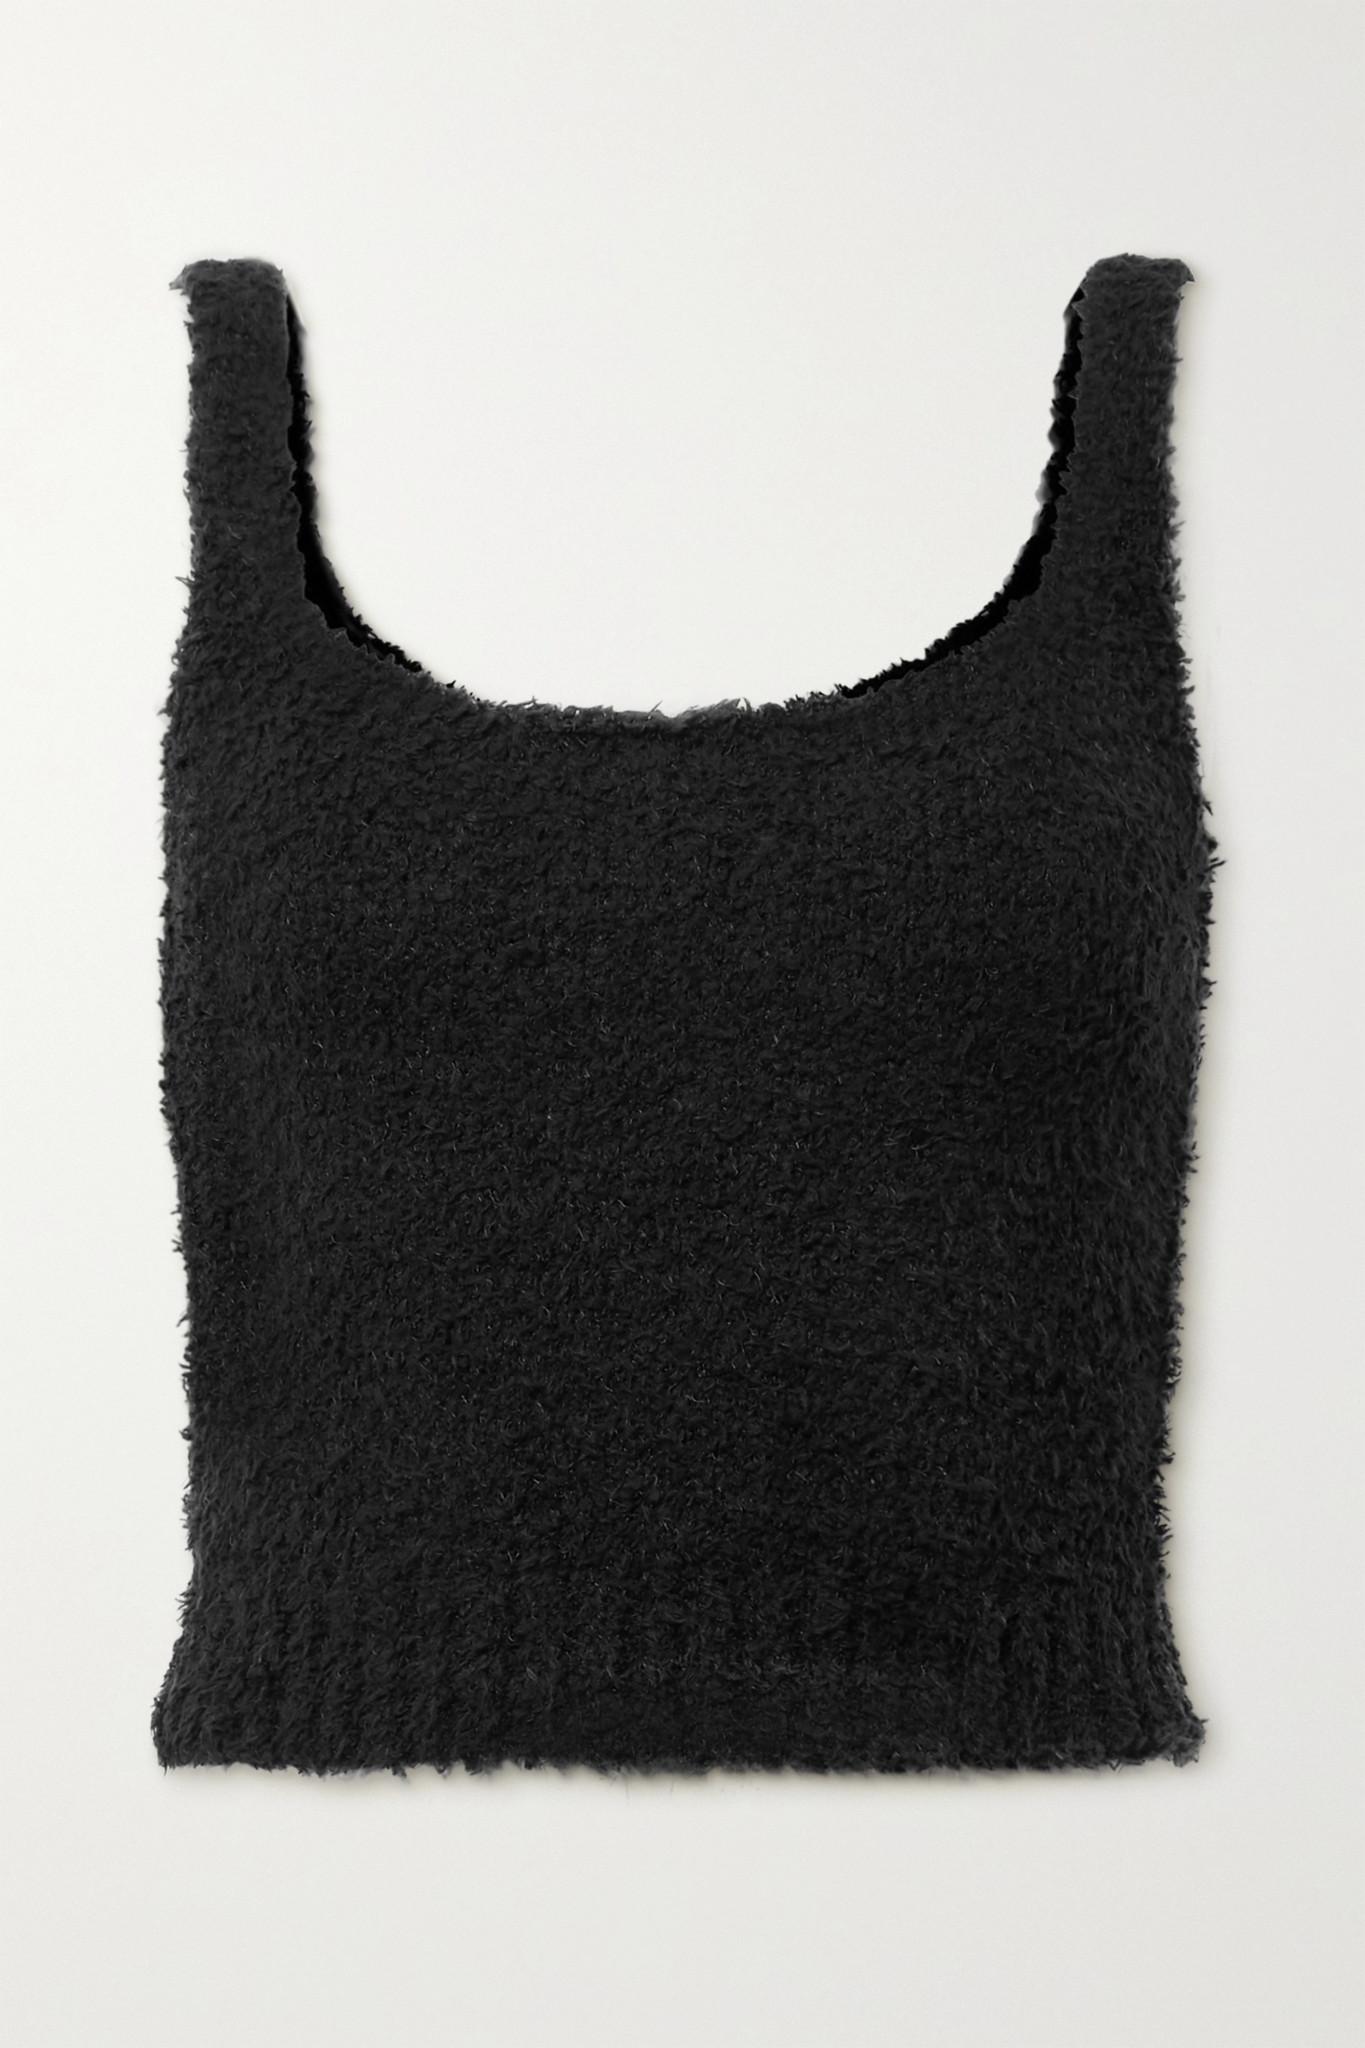 SKIMS - Cozy Knit Bouclé Tank - Bone - Black - S/M